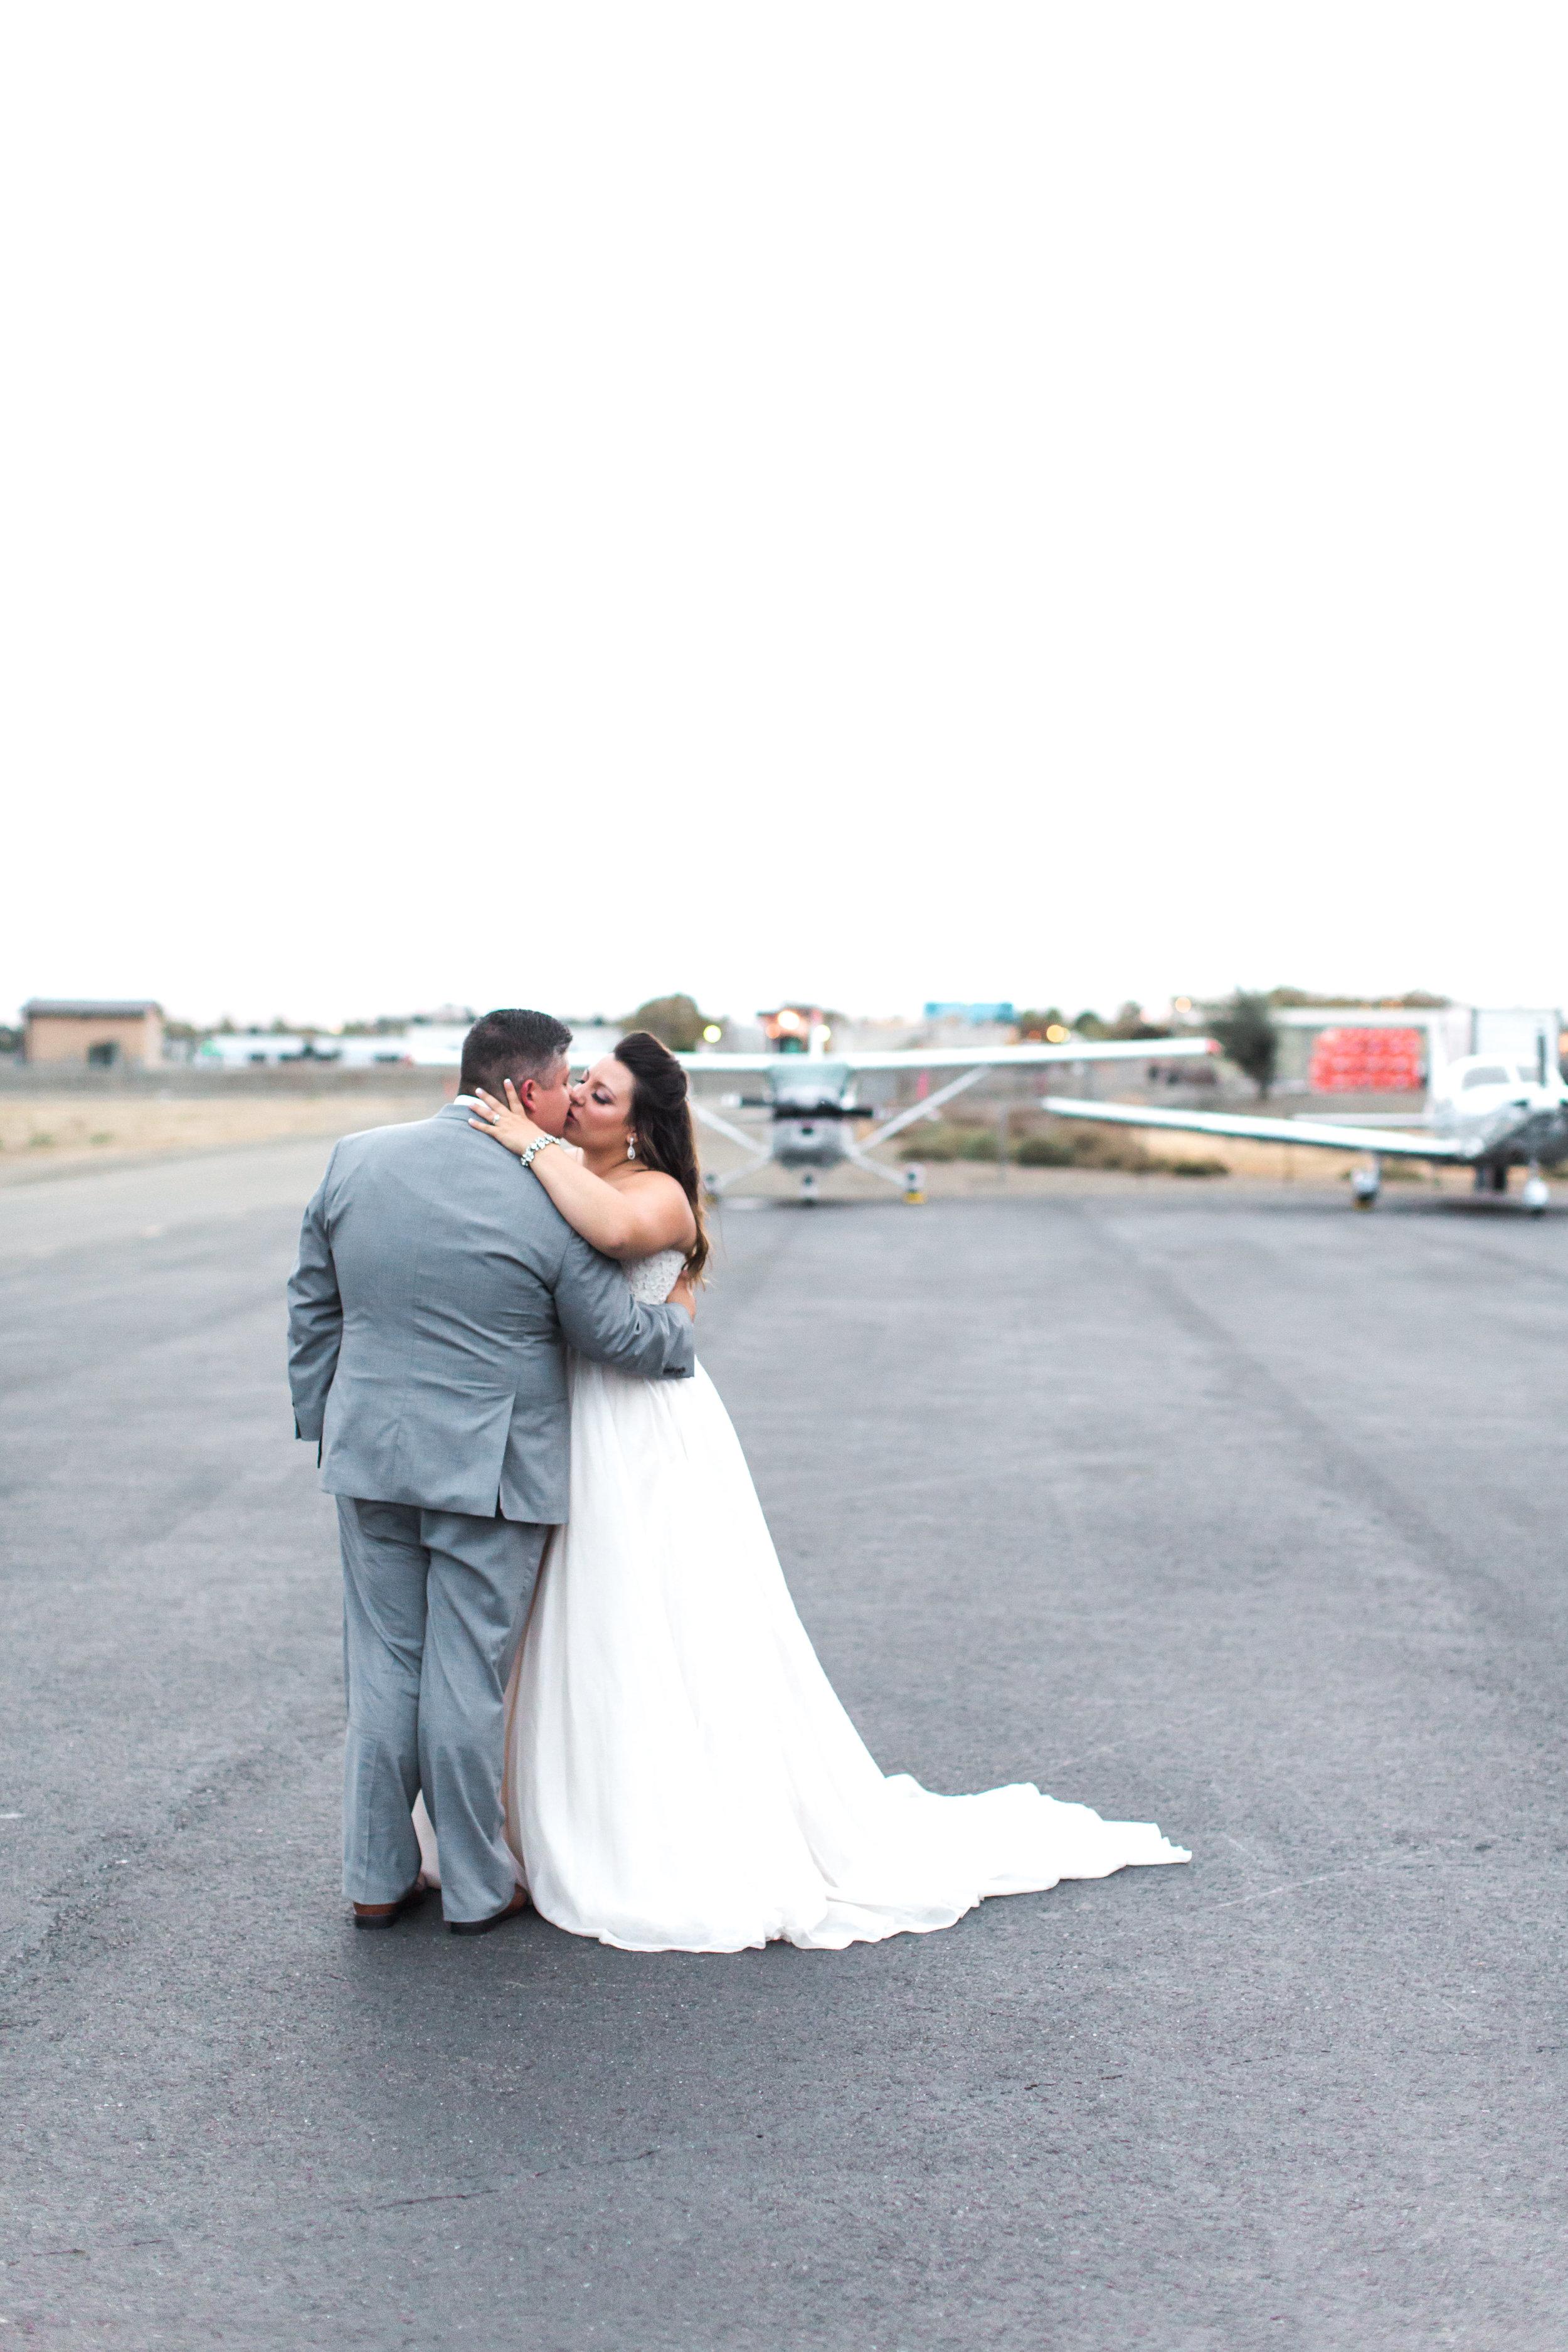 airport-hanger-wedding-at-attitude-aviation-in-livermore-109.jpg